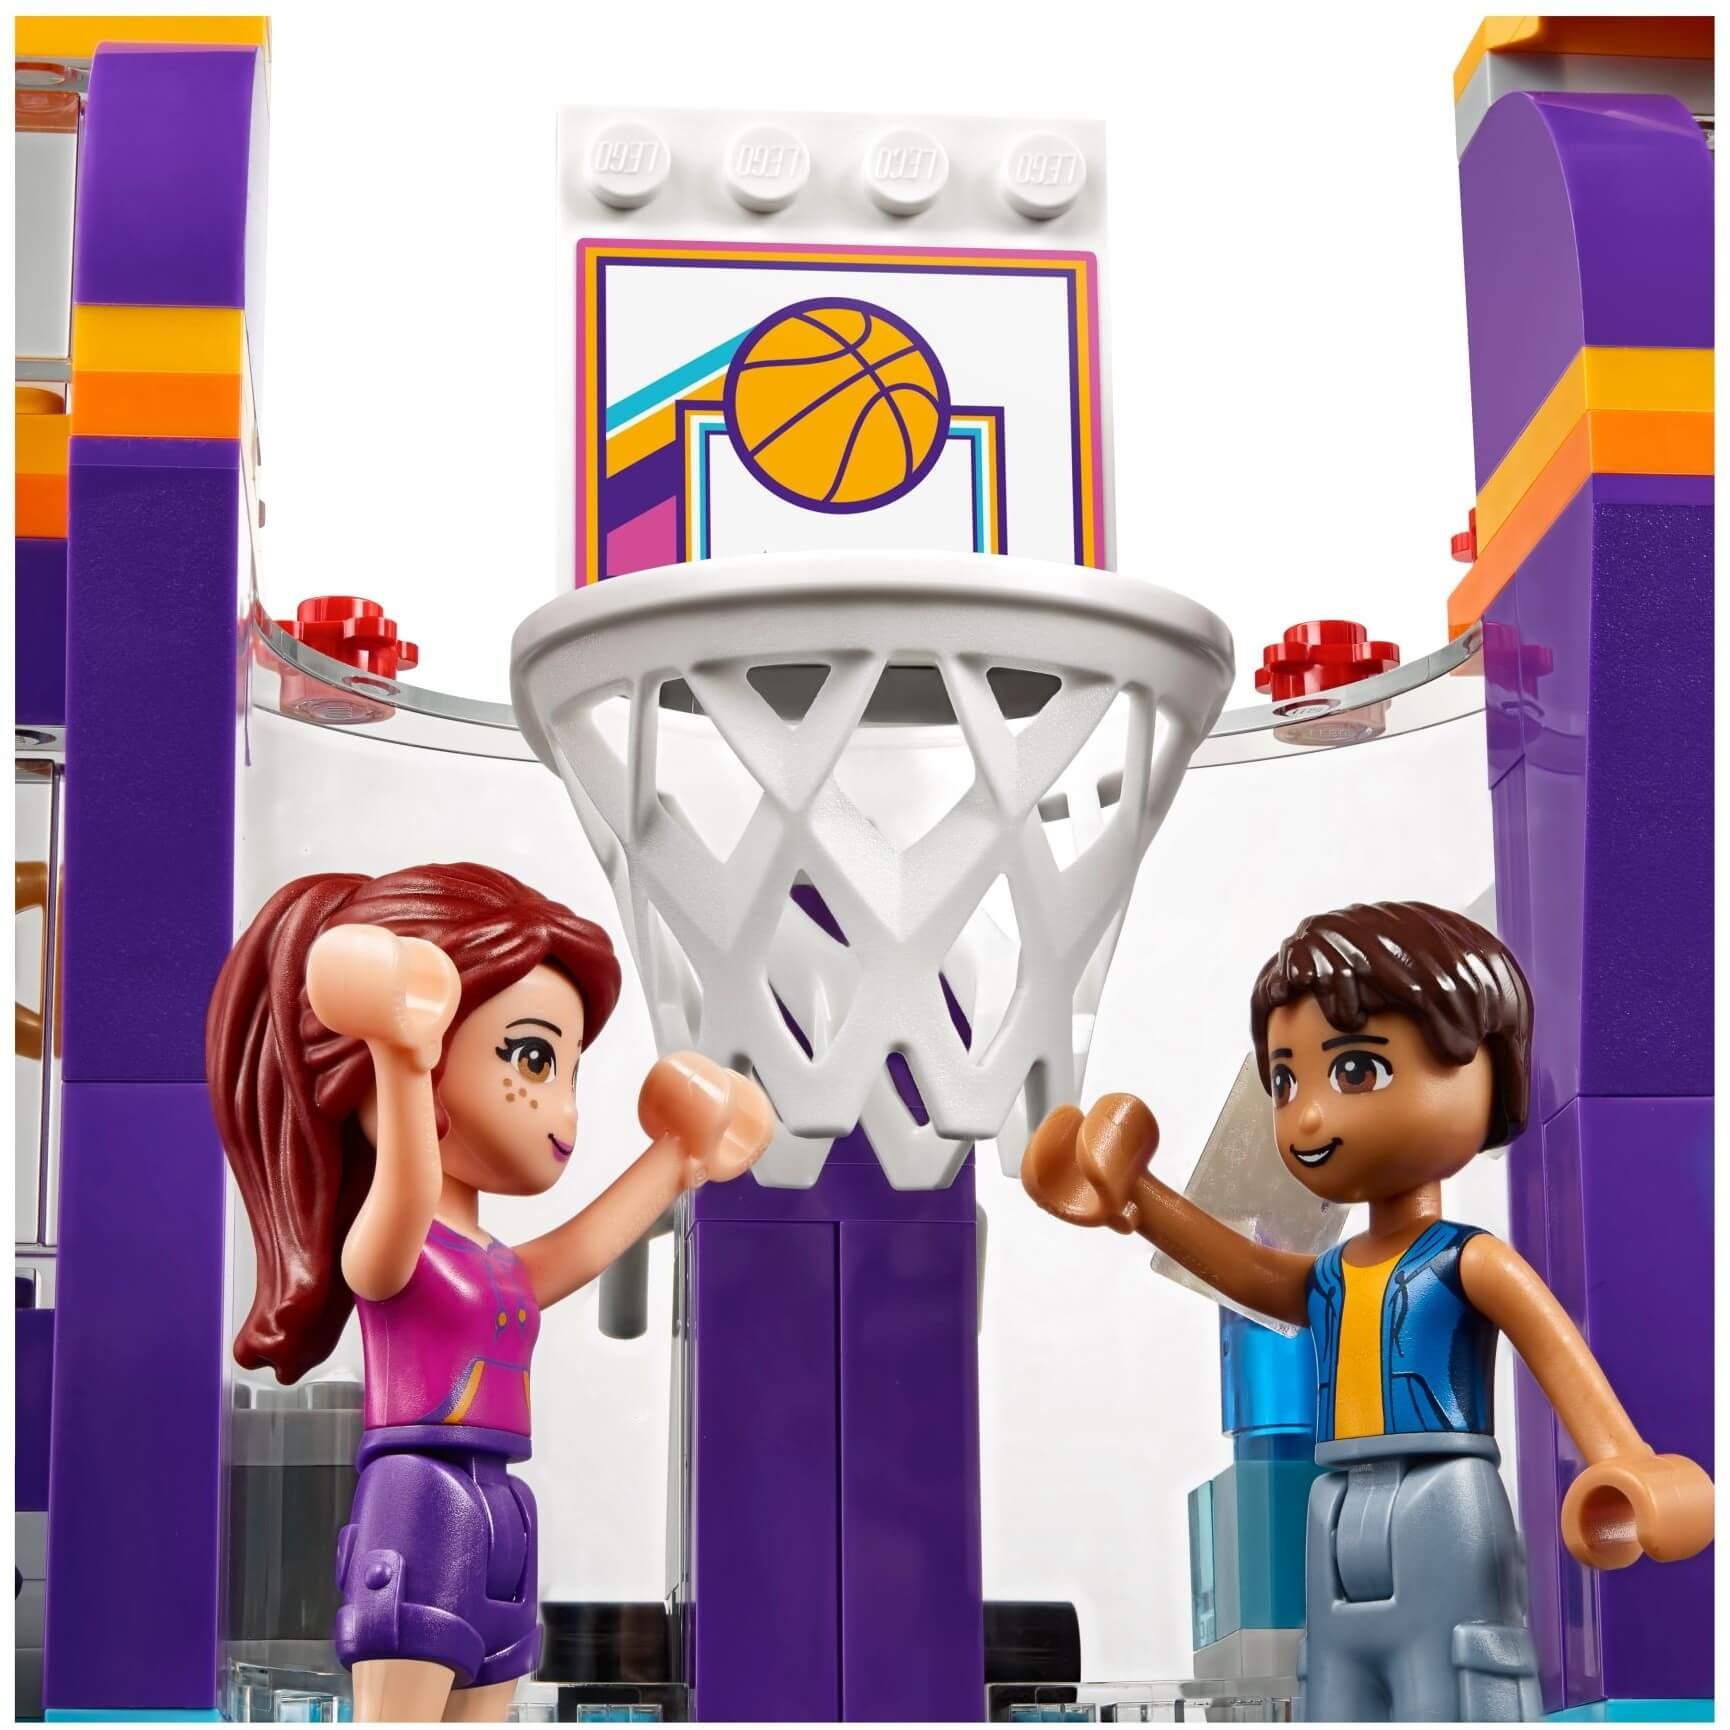 Mua đồ chơi LEGO 41312 - LEGO Friends 41312 - Trung Tâm Thể Thao Heartlake (LEGO 41312 Heartlake Sports Center)